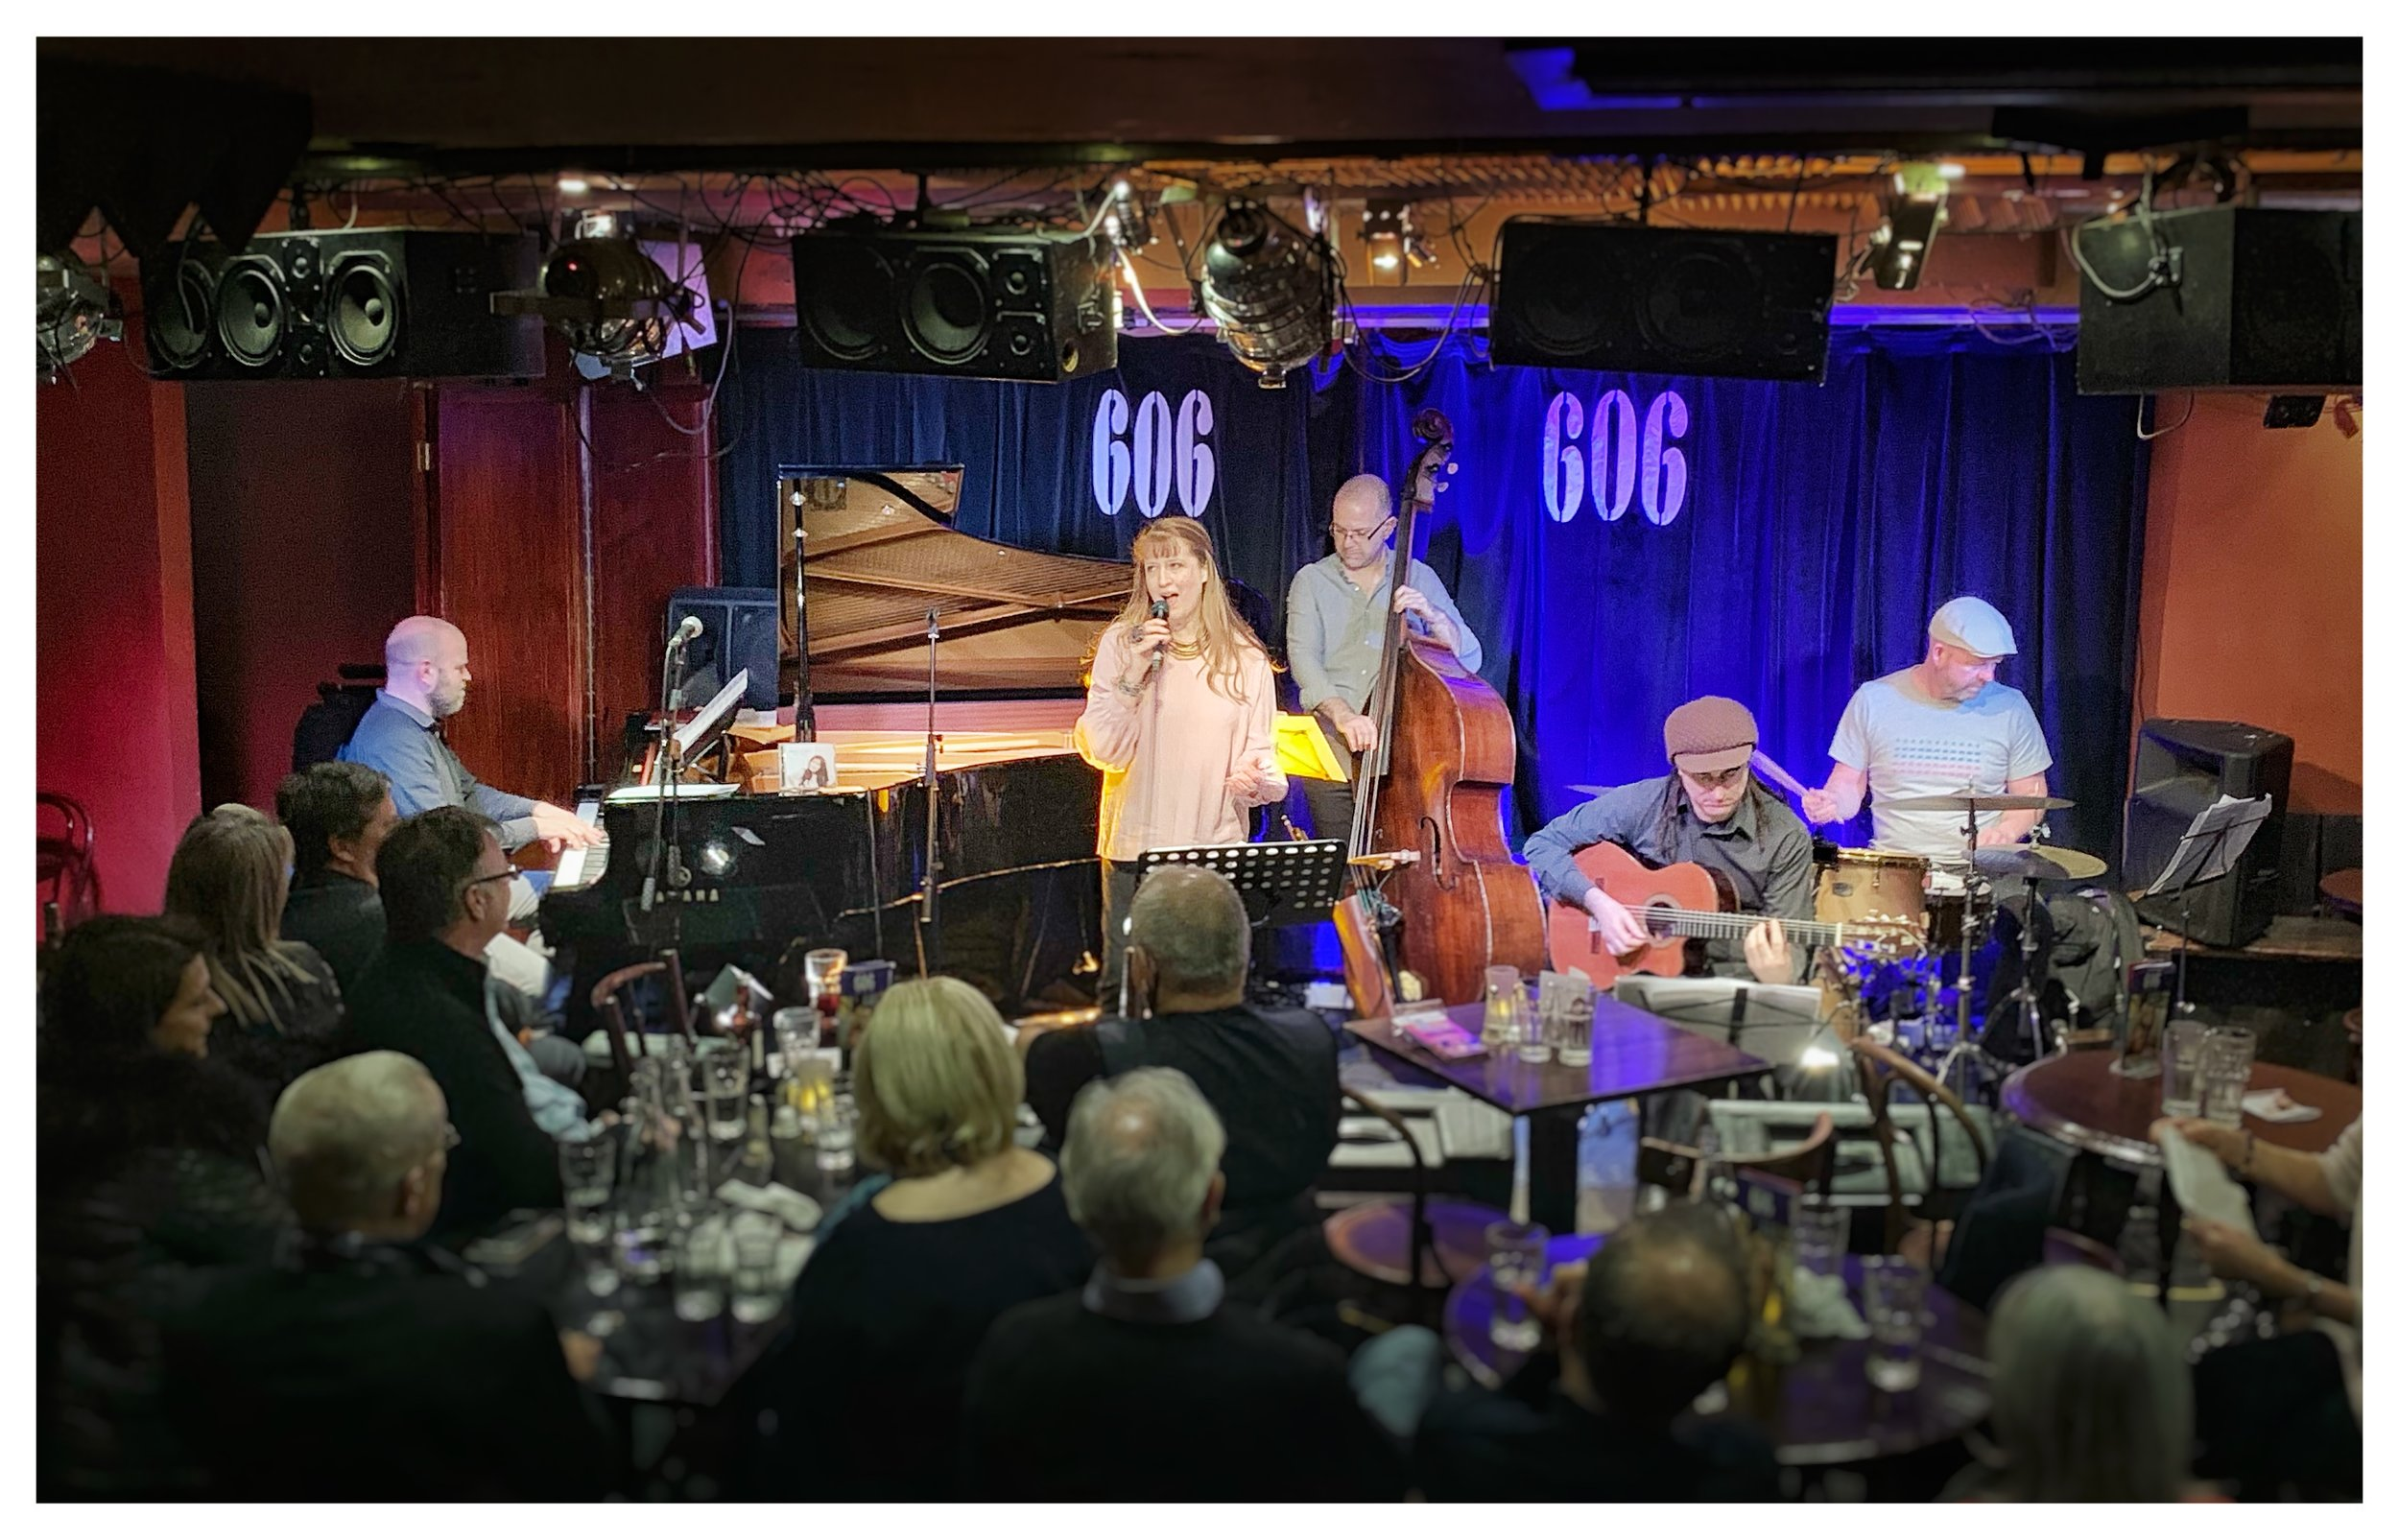 Daniela's Quintet performing at London's 606 Jazz Club 27/1/19